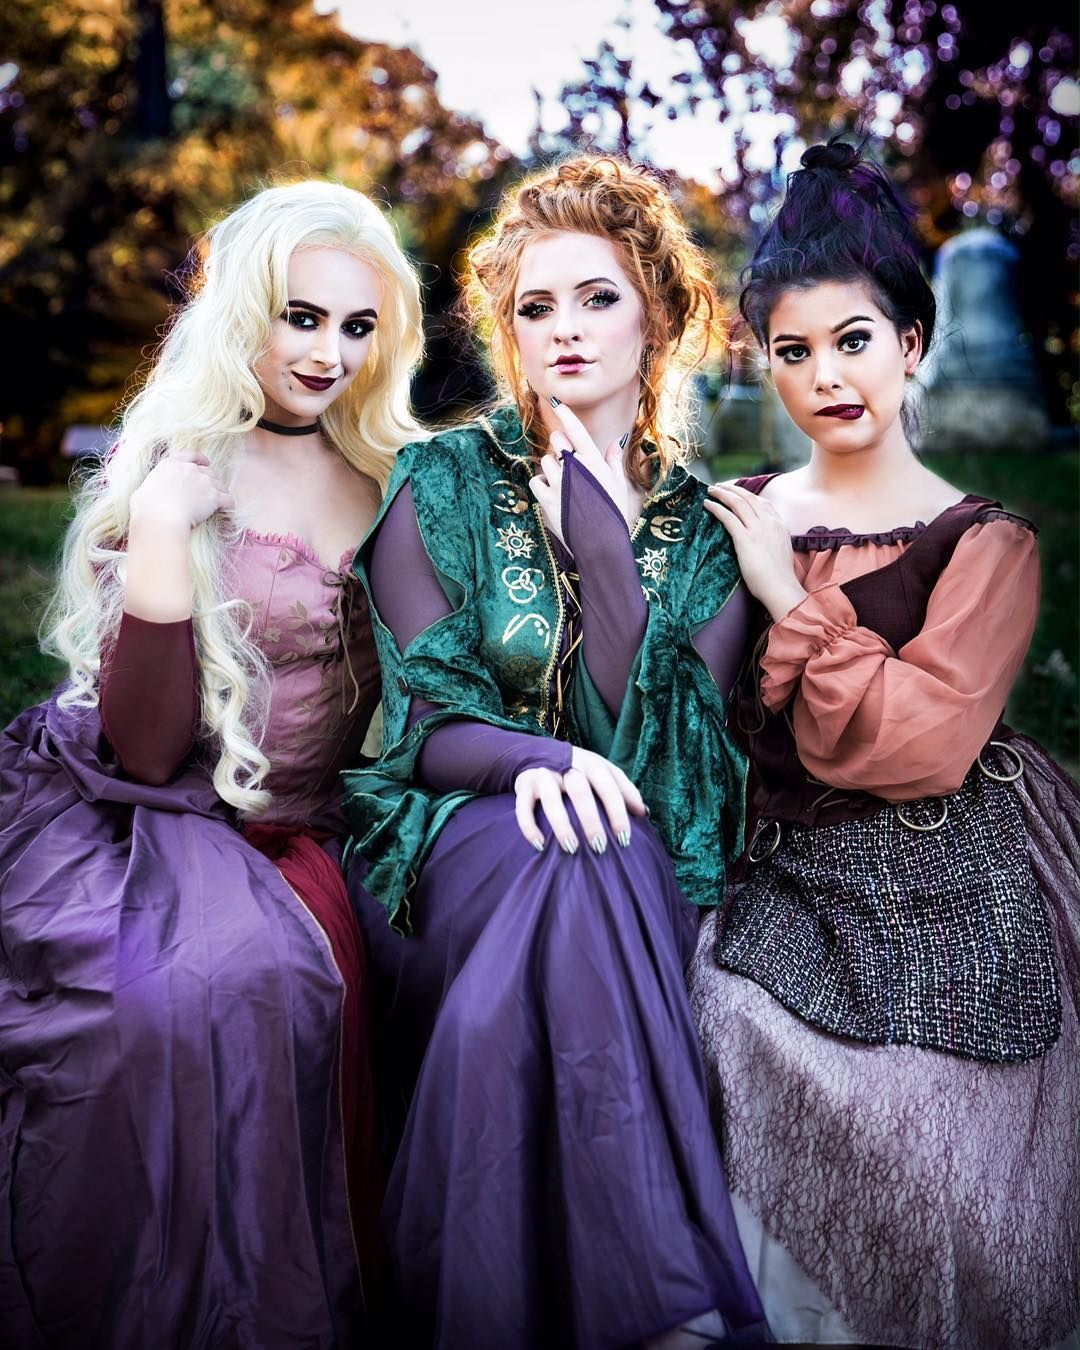 Inspiration Accessories Diy Sanderson Hocus Pocus Halloween Costume Idea 31days Halloween Costumes Friends Disney Halloween Costumes Diy Halloween Costumes